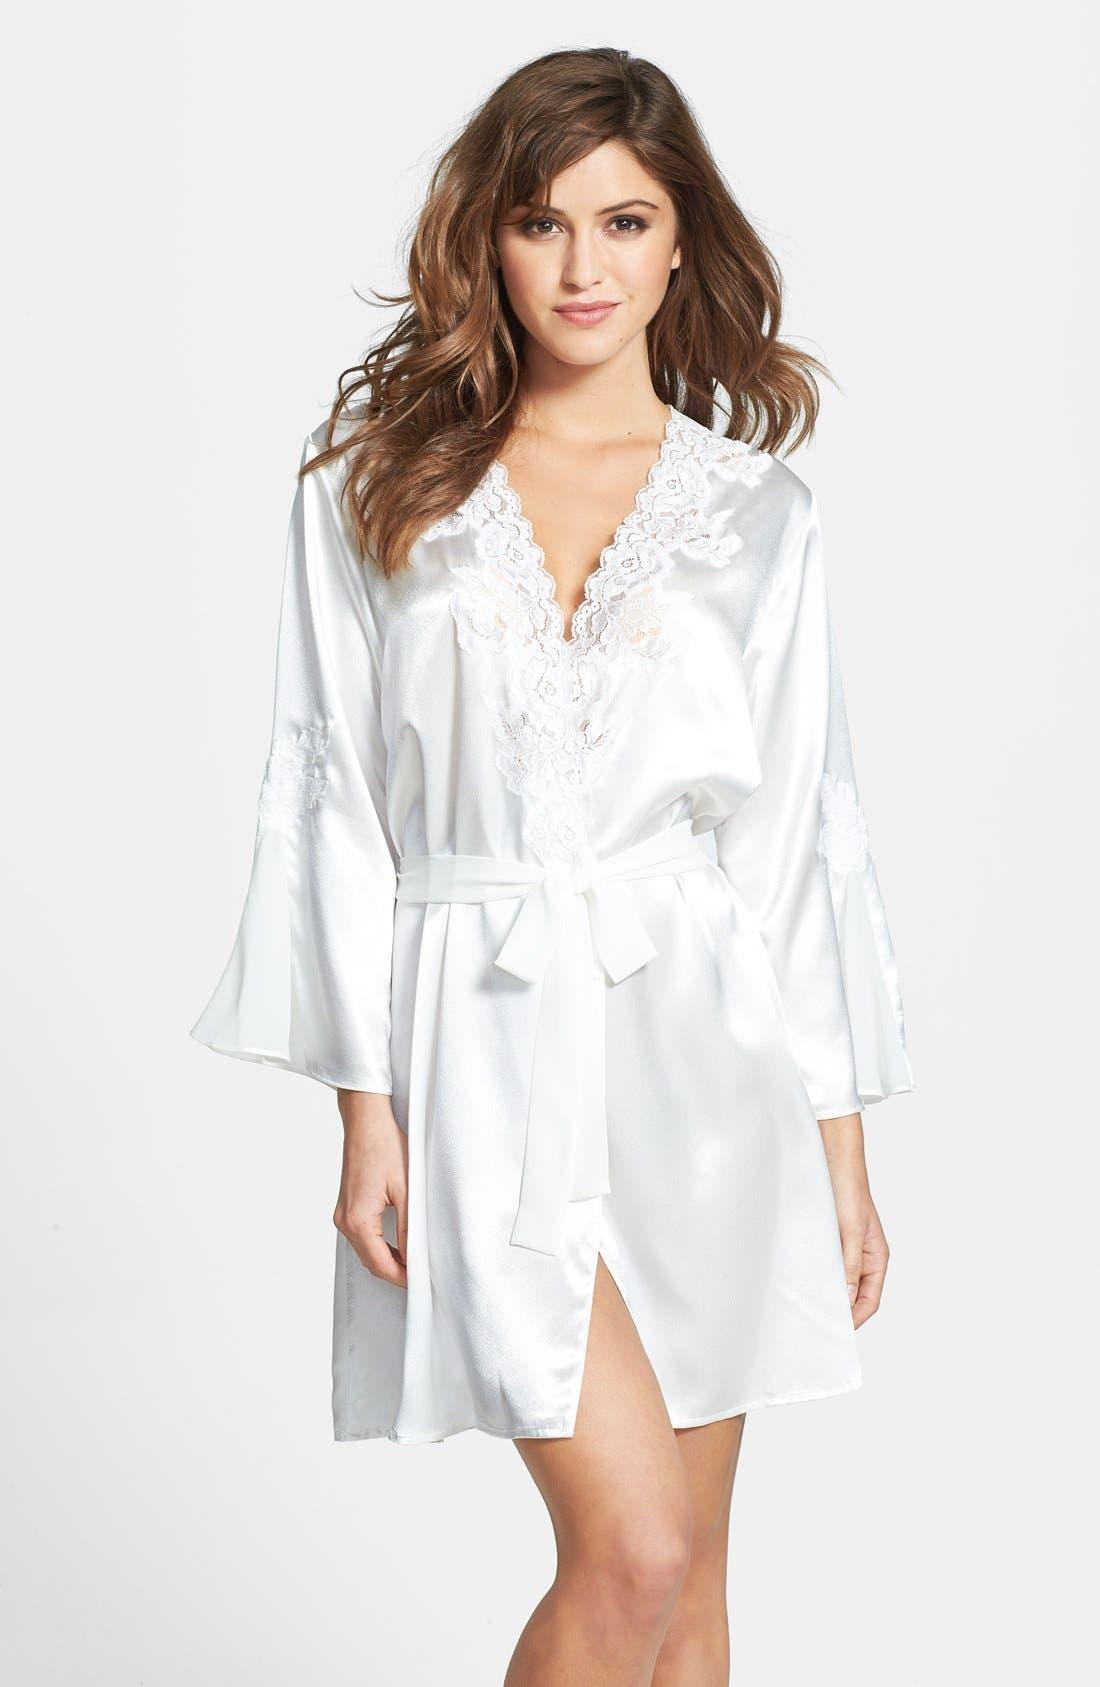 Main Image - Oscar de la Renta Sleepwear 'Evening Bliss' Satin Charmeuse Wrap Robe